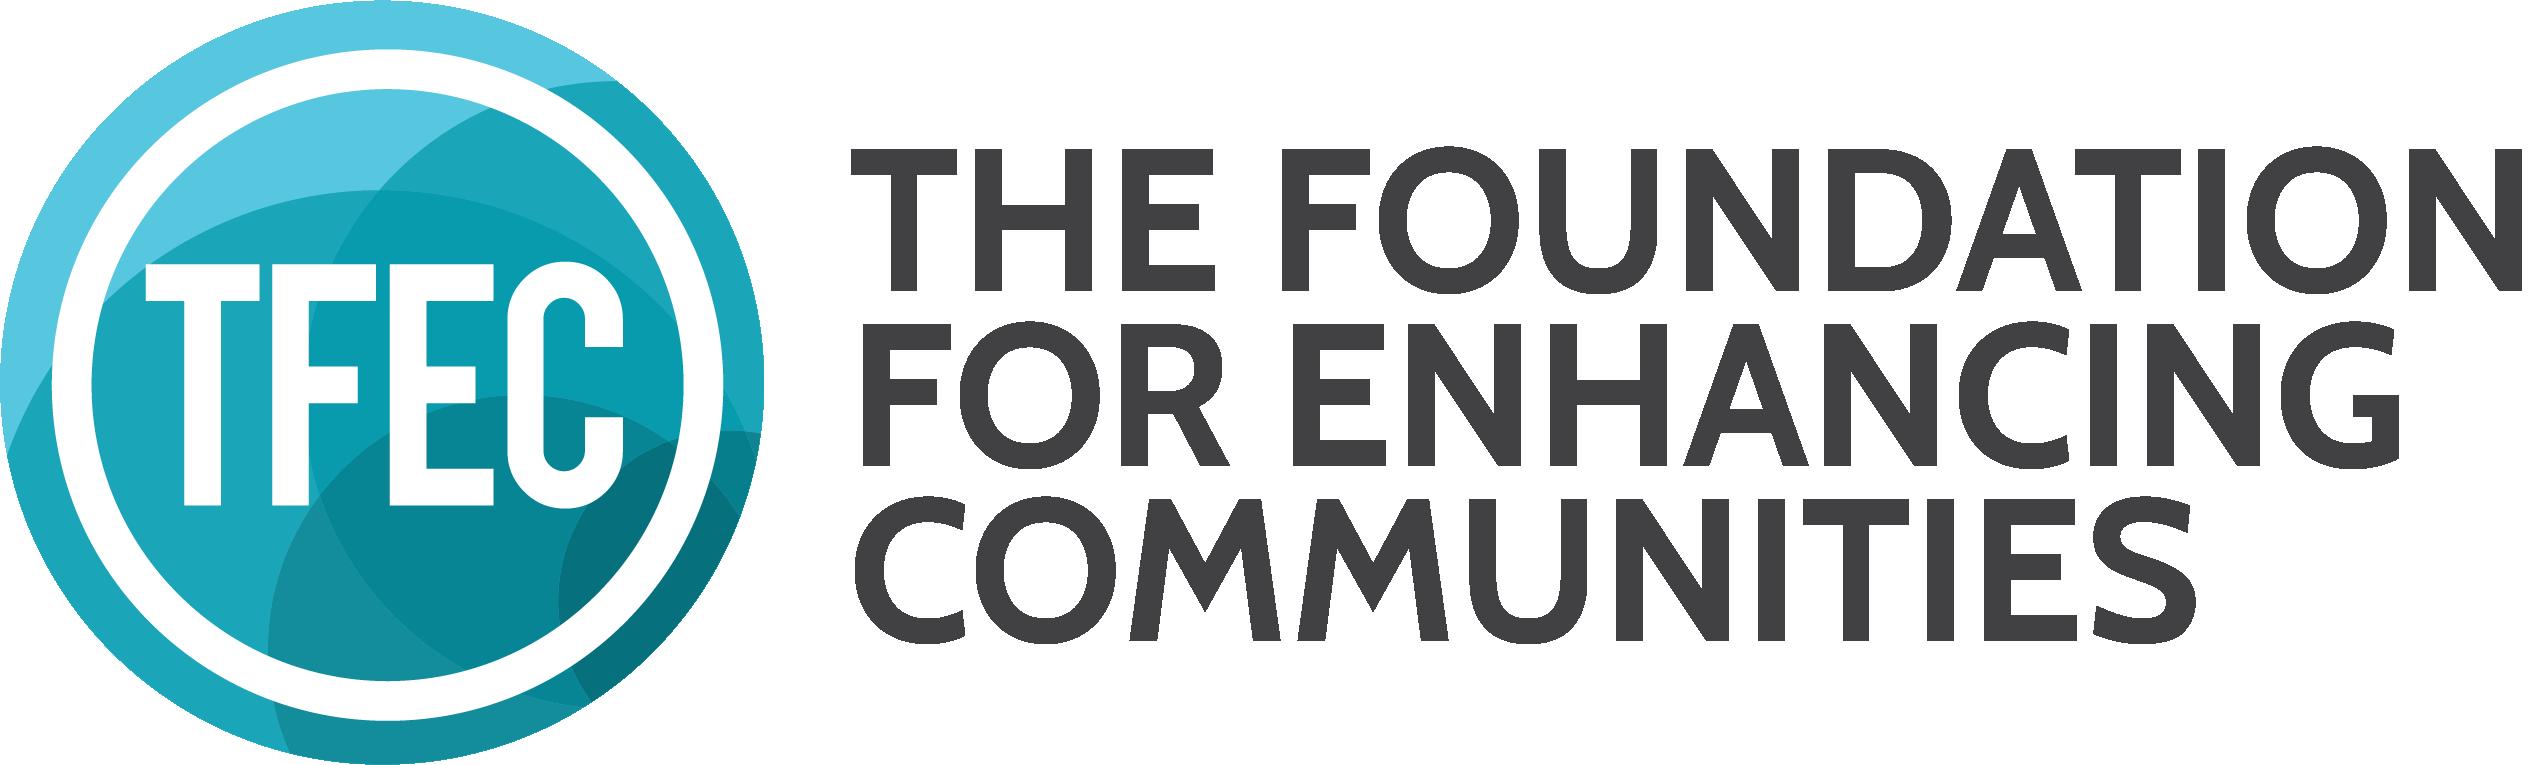 TFEC Grants more than $660,000 to 142 Regional Nonprofit